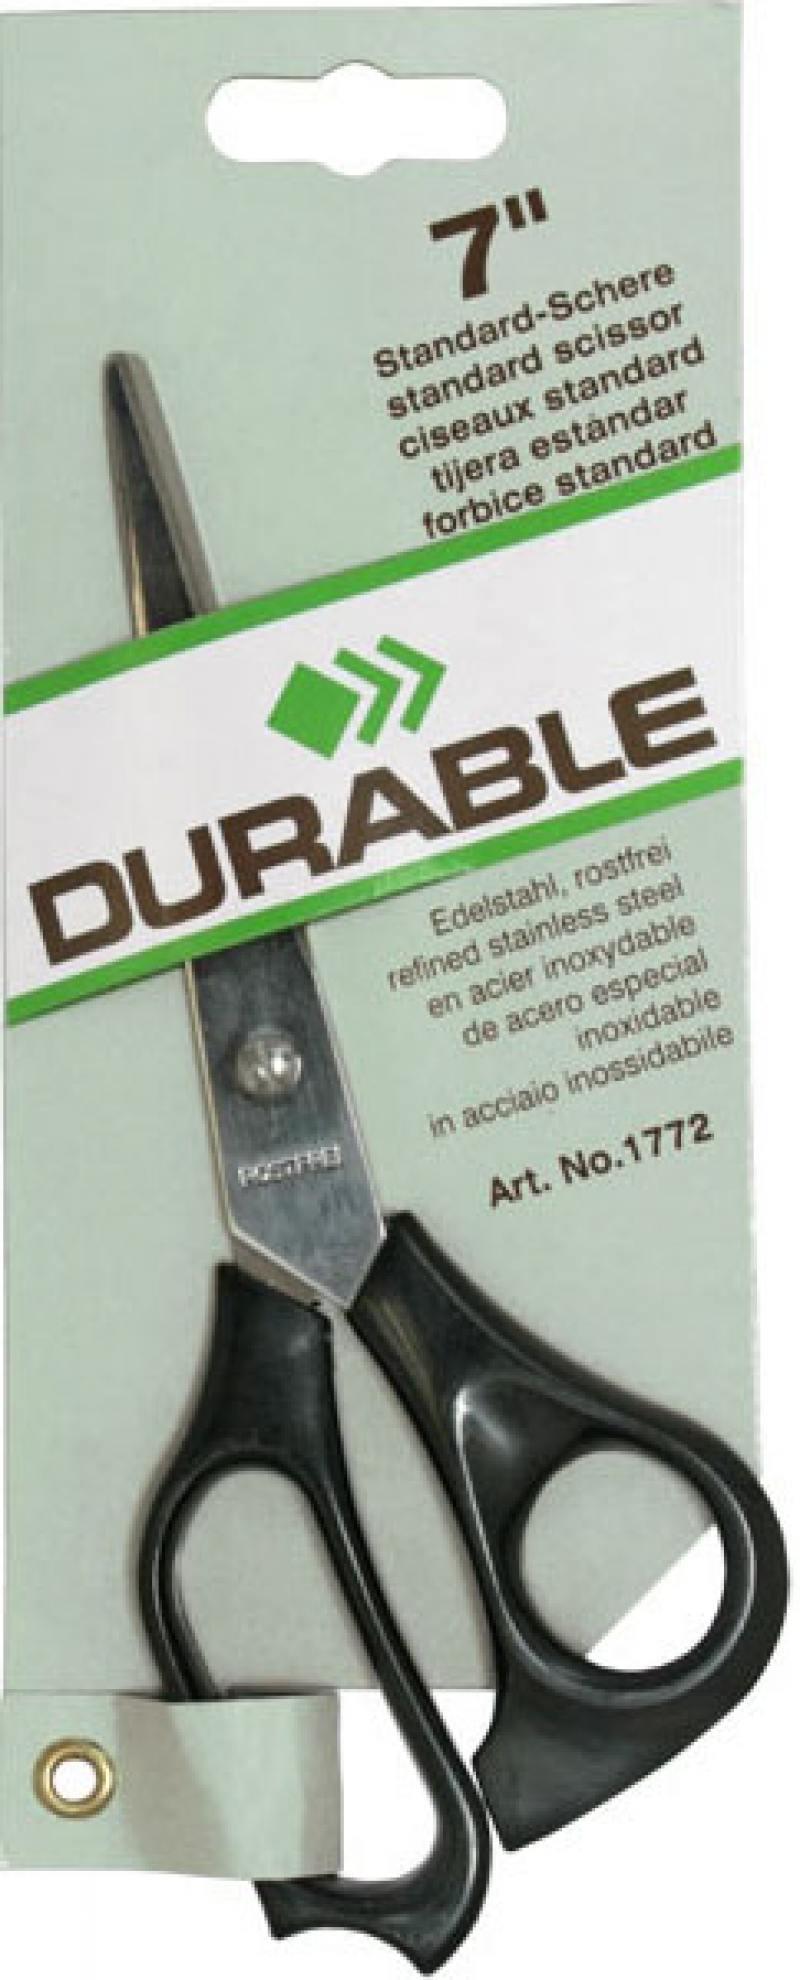 Ножницы Durable 1772-01 18 см comix durable 50 page 12 stapler w staples blue 3 pcs